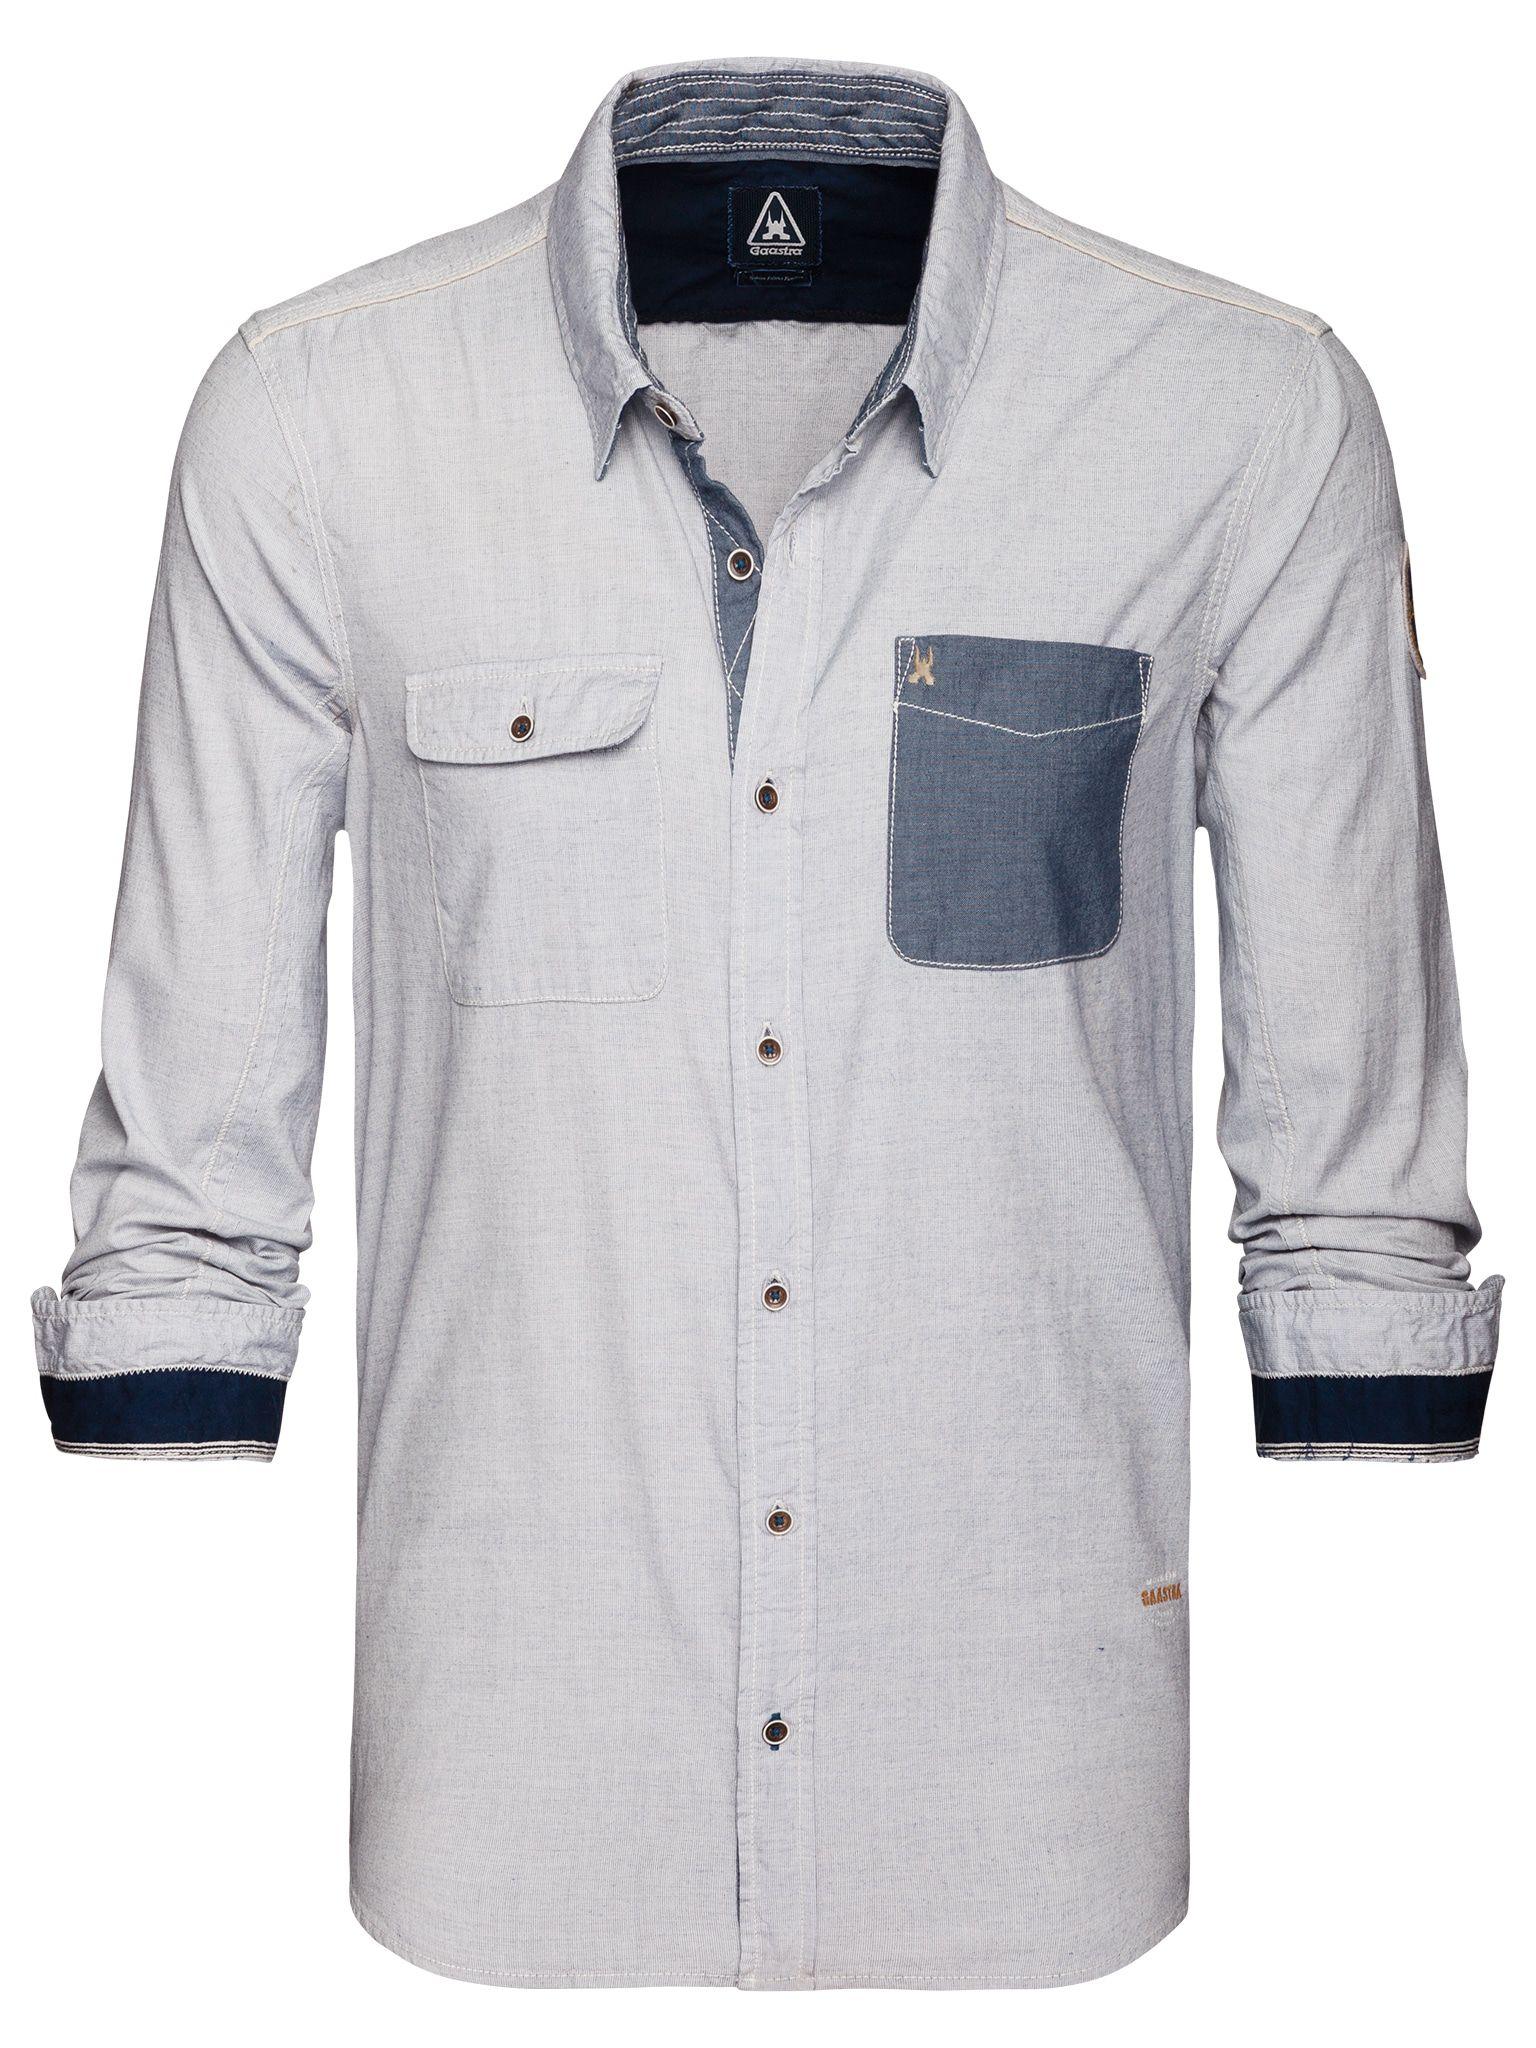 Gaastra Day Sailor Shirt Whisperwhite